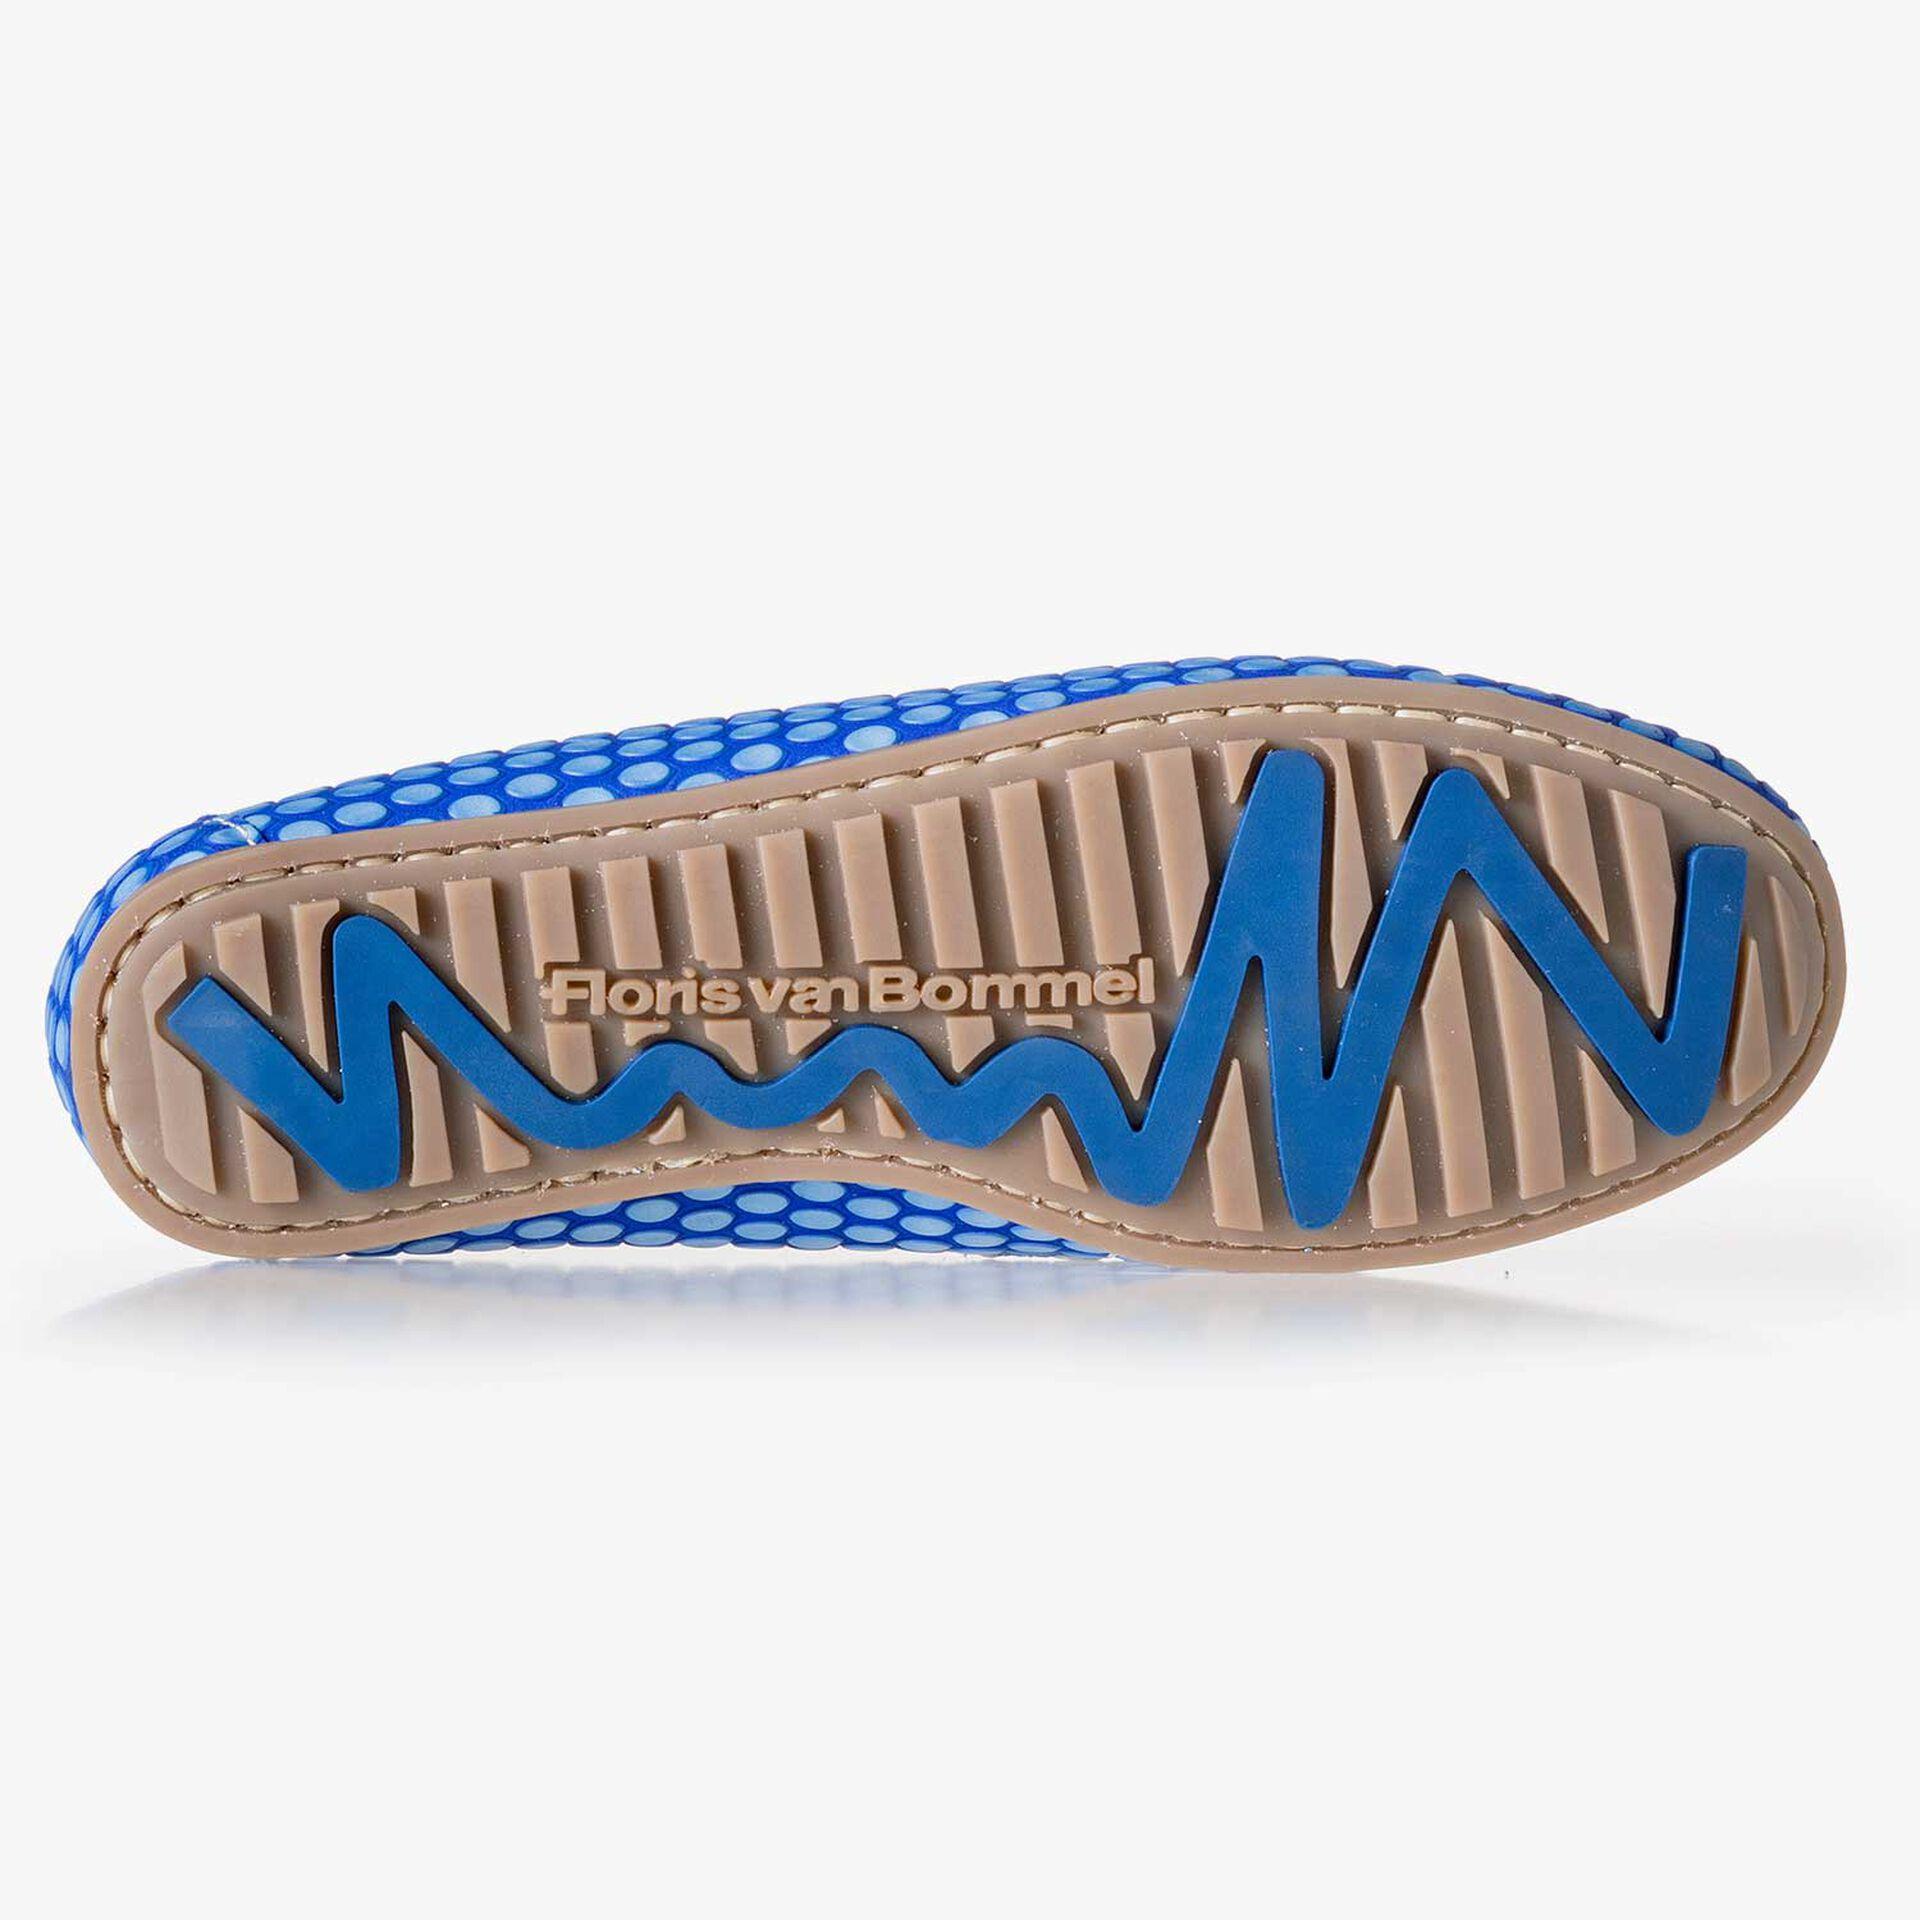 Cobalt blue, printed leather boat shoe